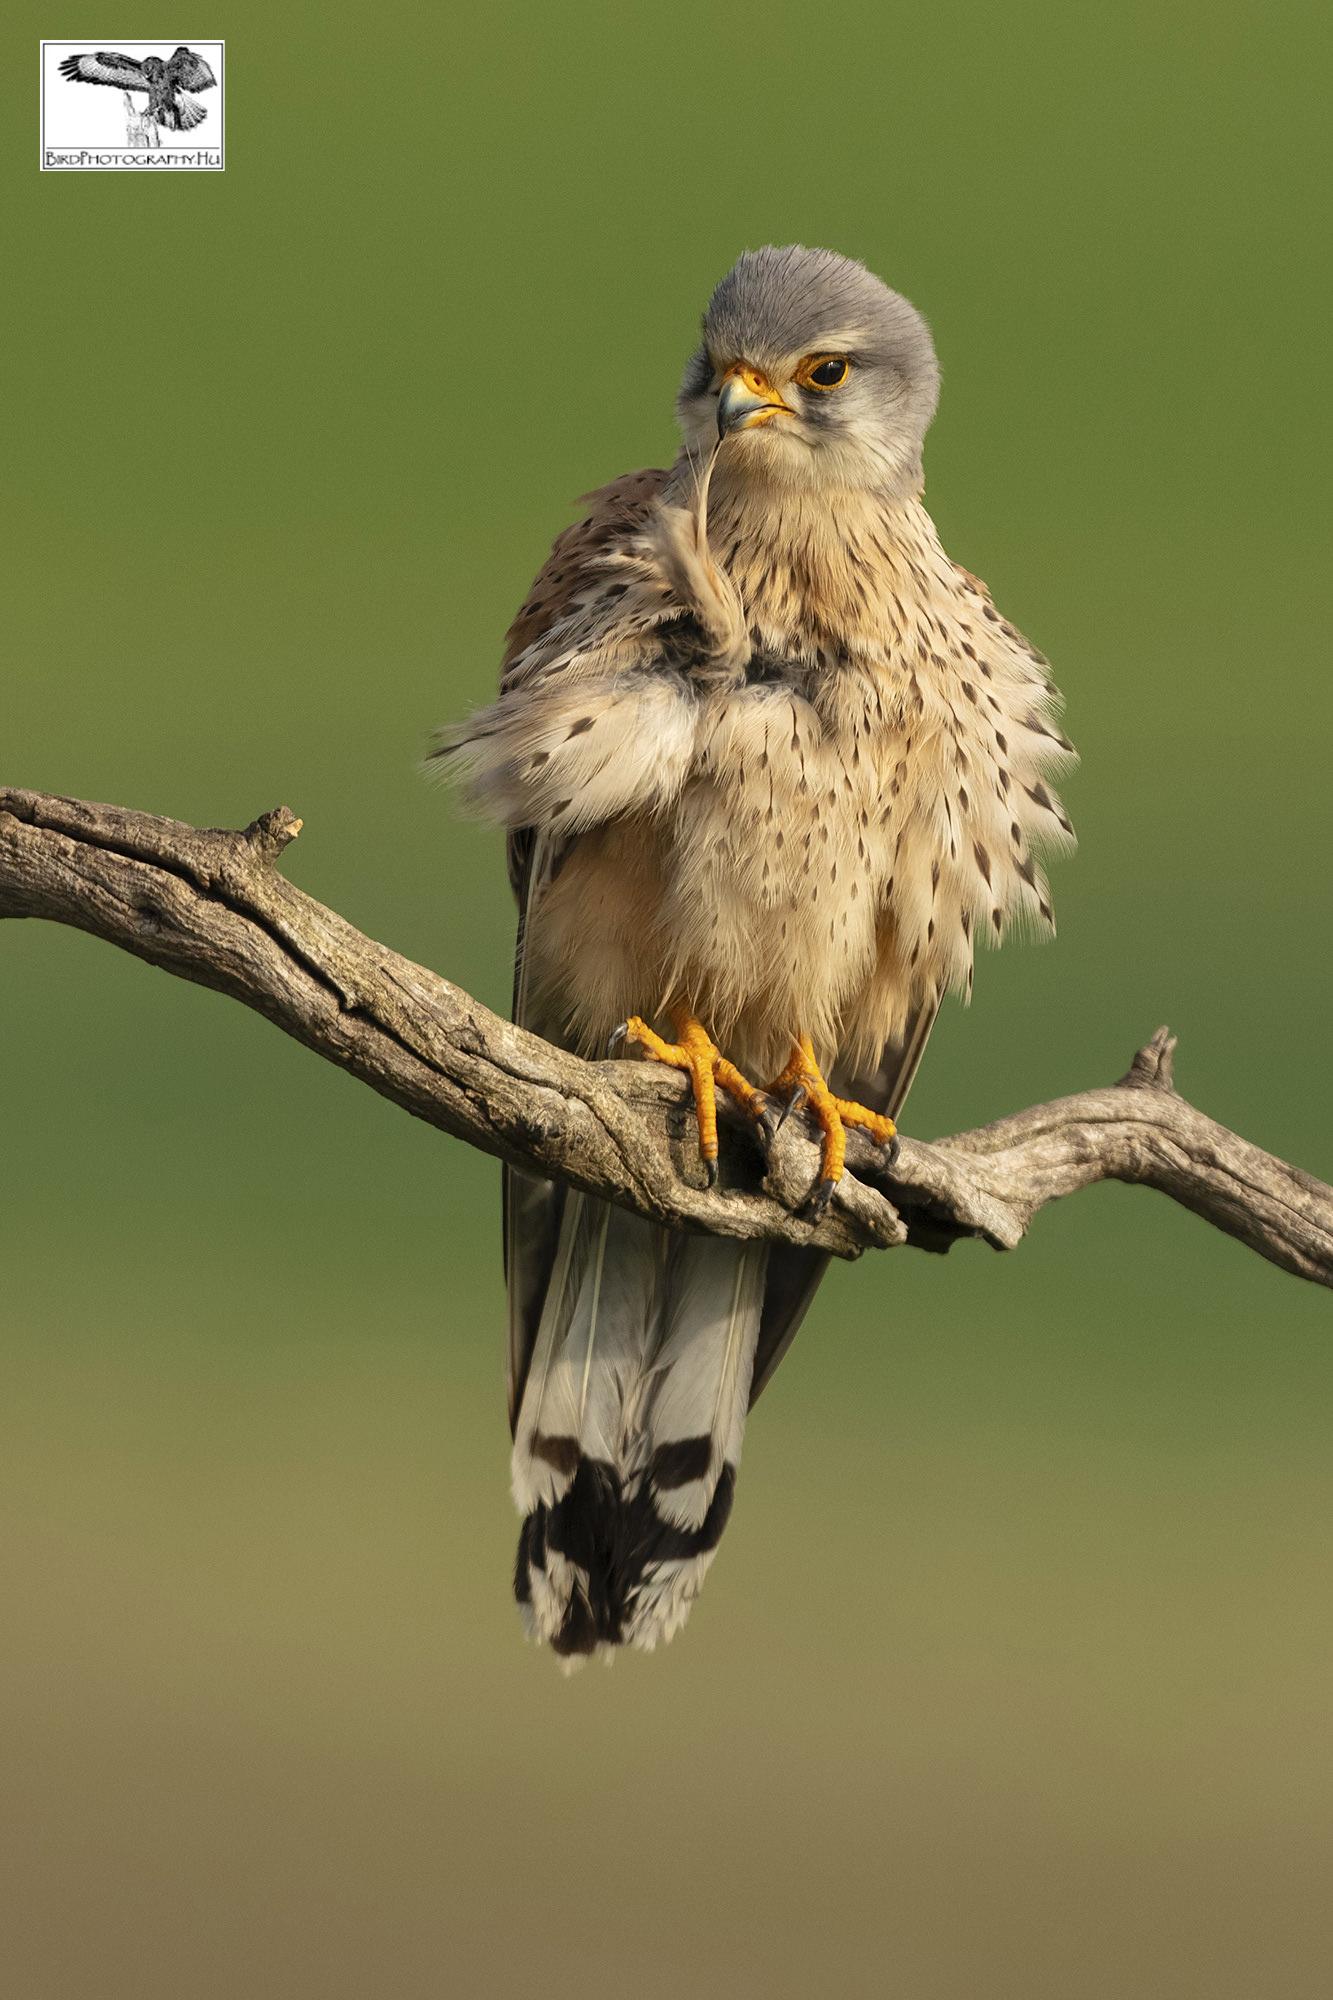 Vörös vércse, Common Kestrel, Turmfalke, Falco tinnunculus